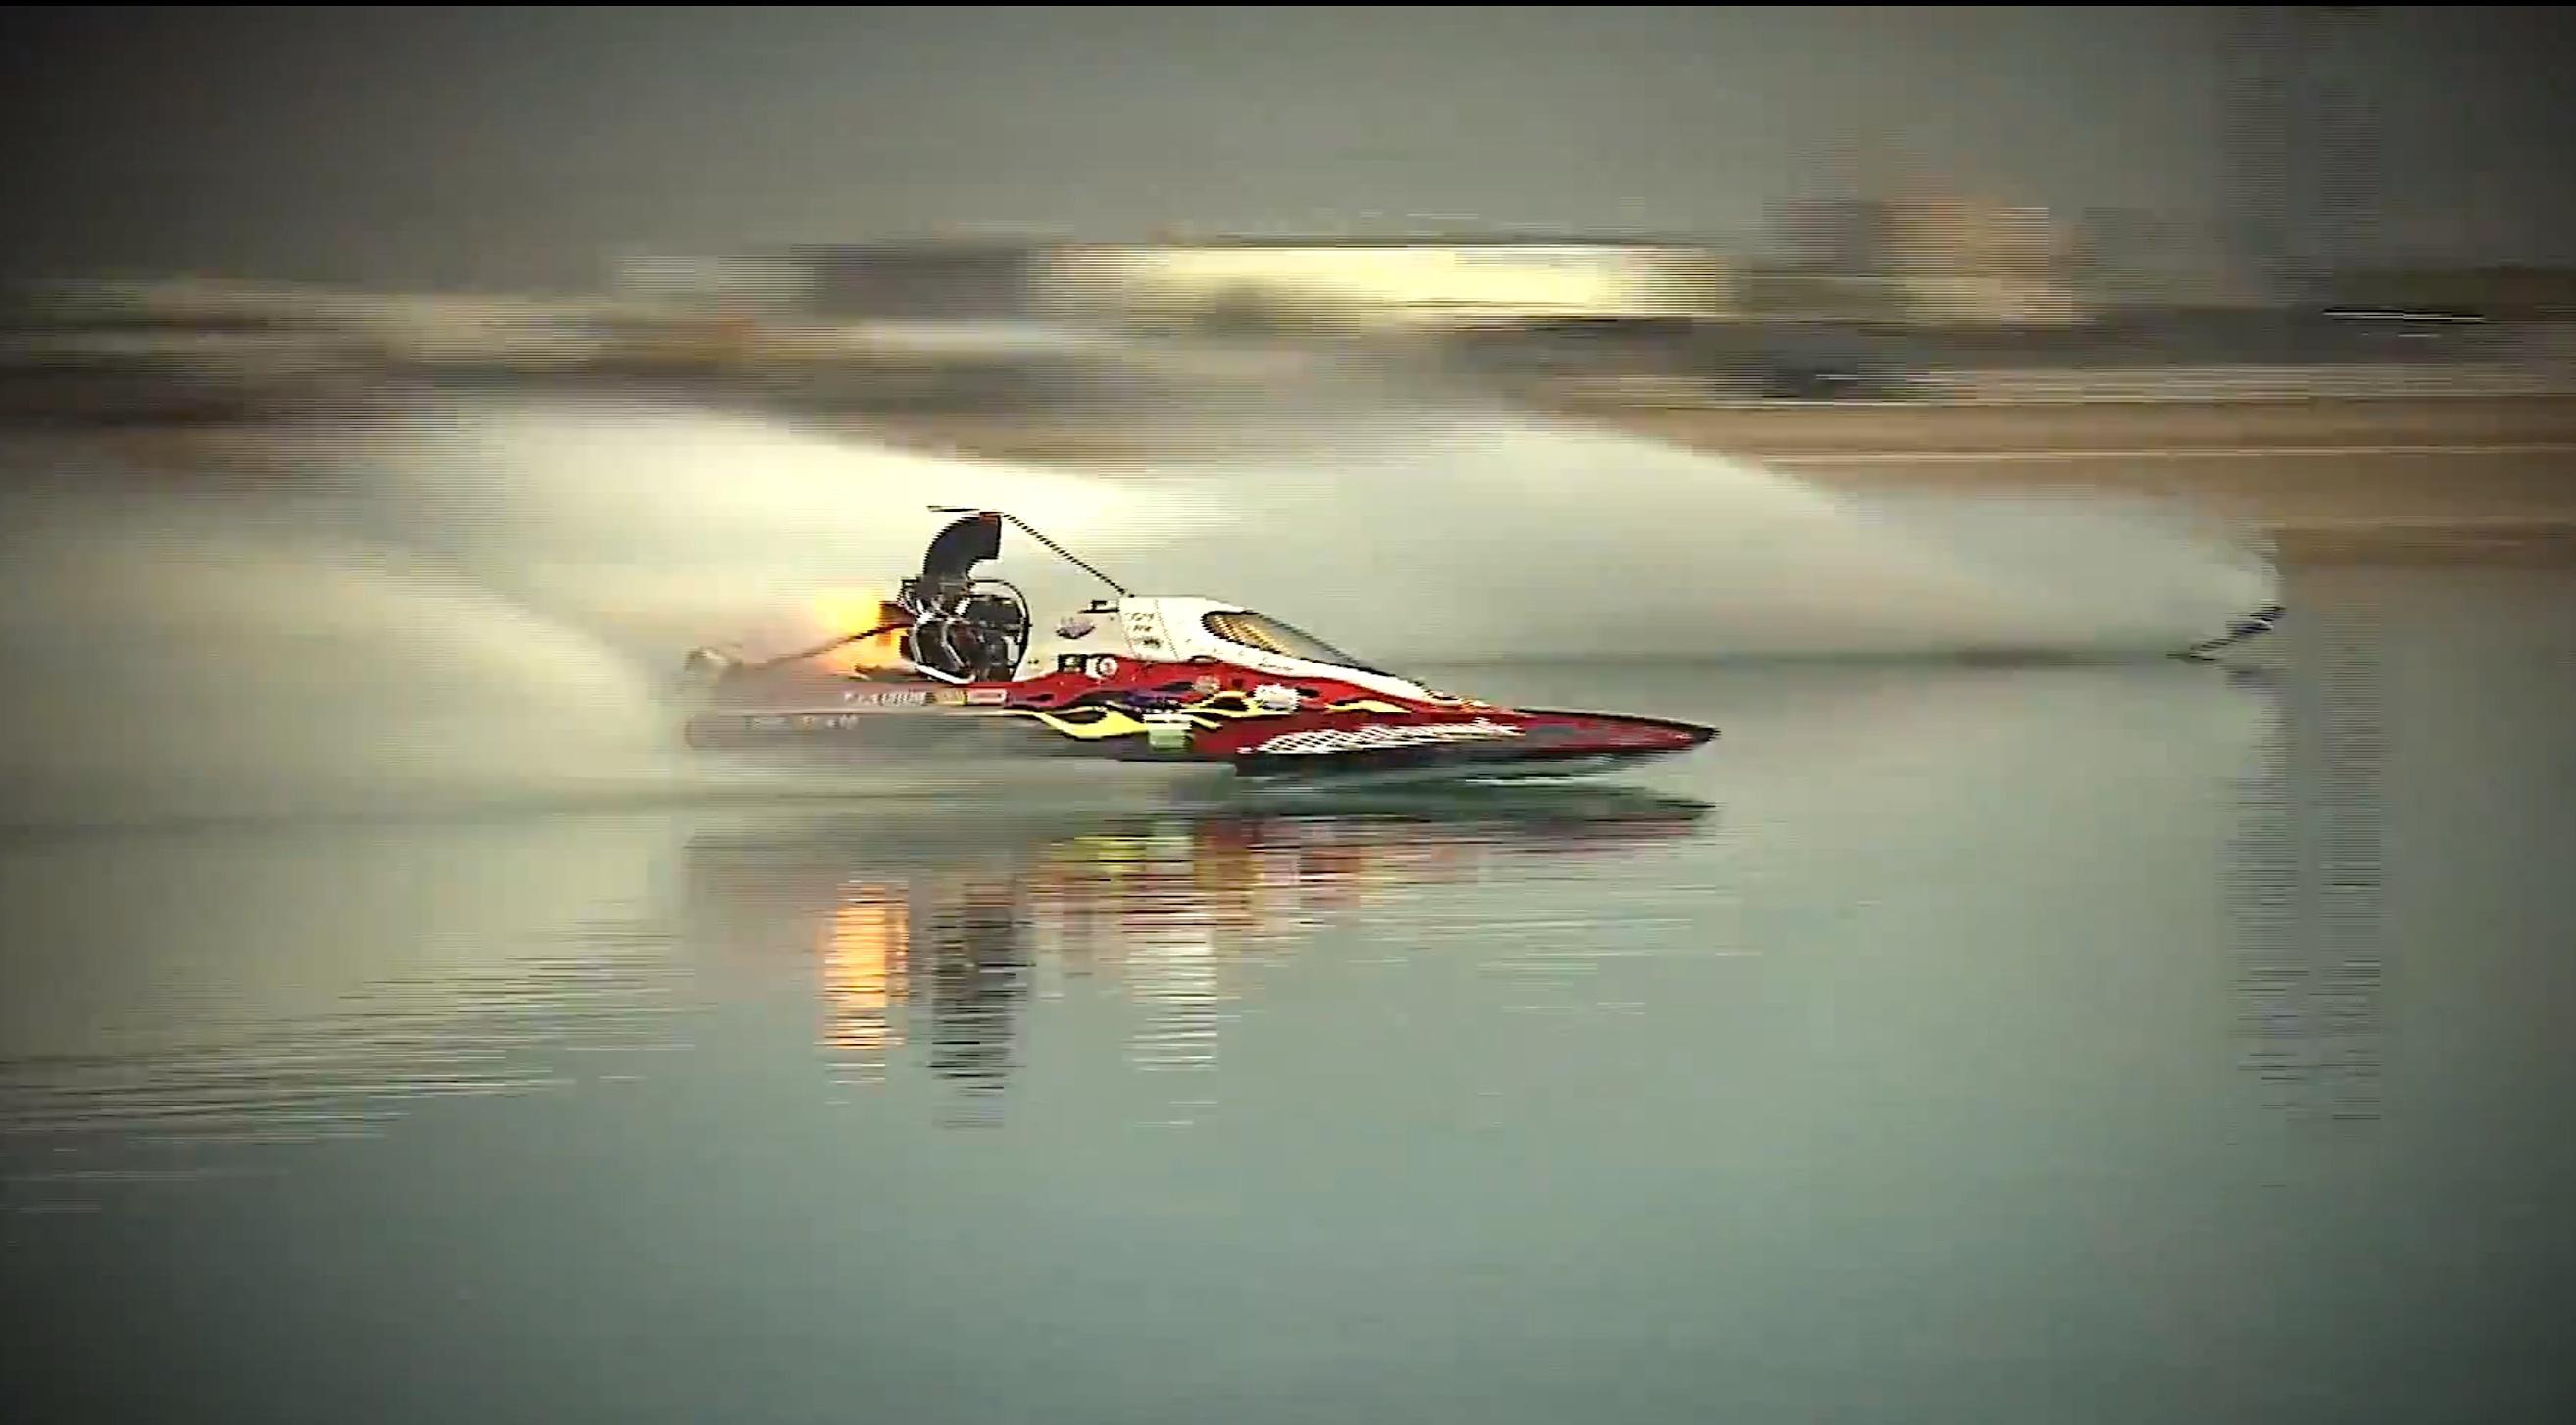 batar_motorbatar_2014_DragRacing_Dragboatracing_FB